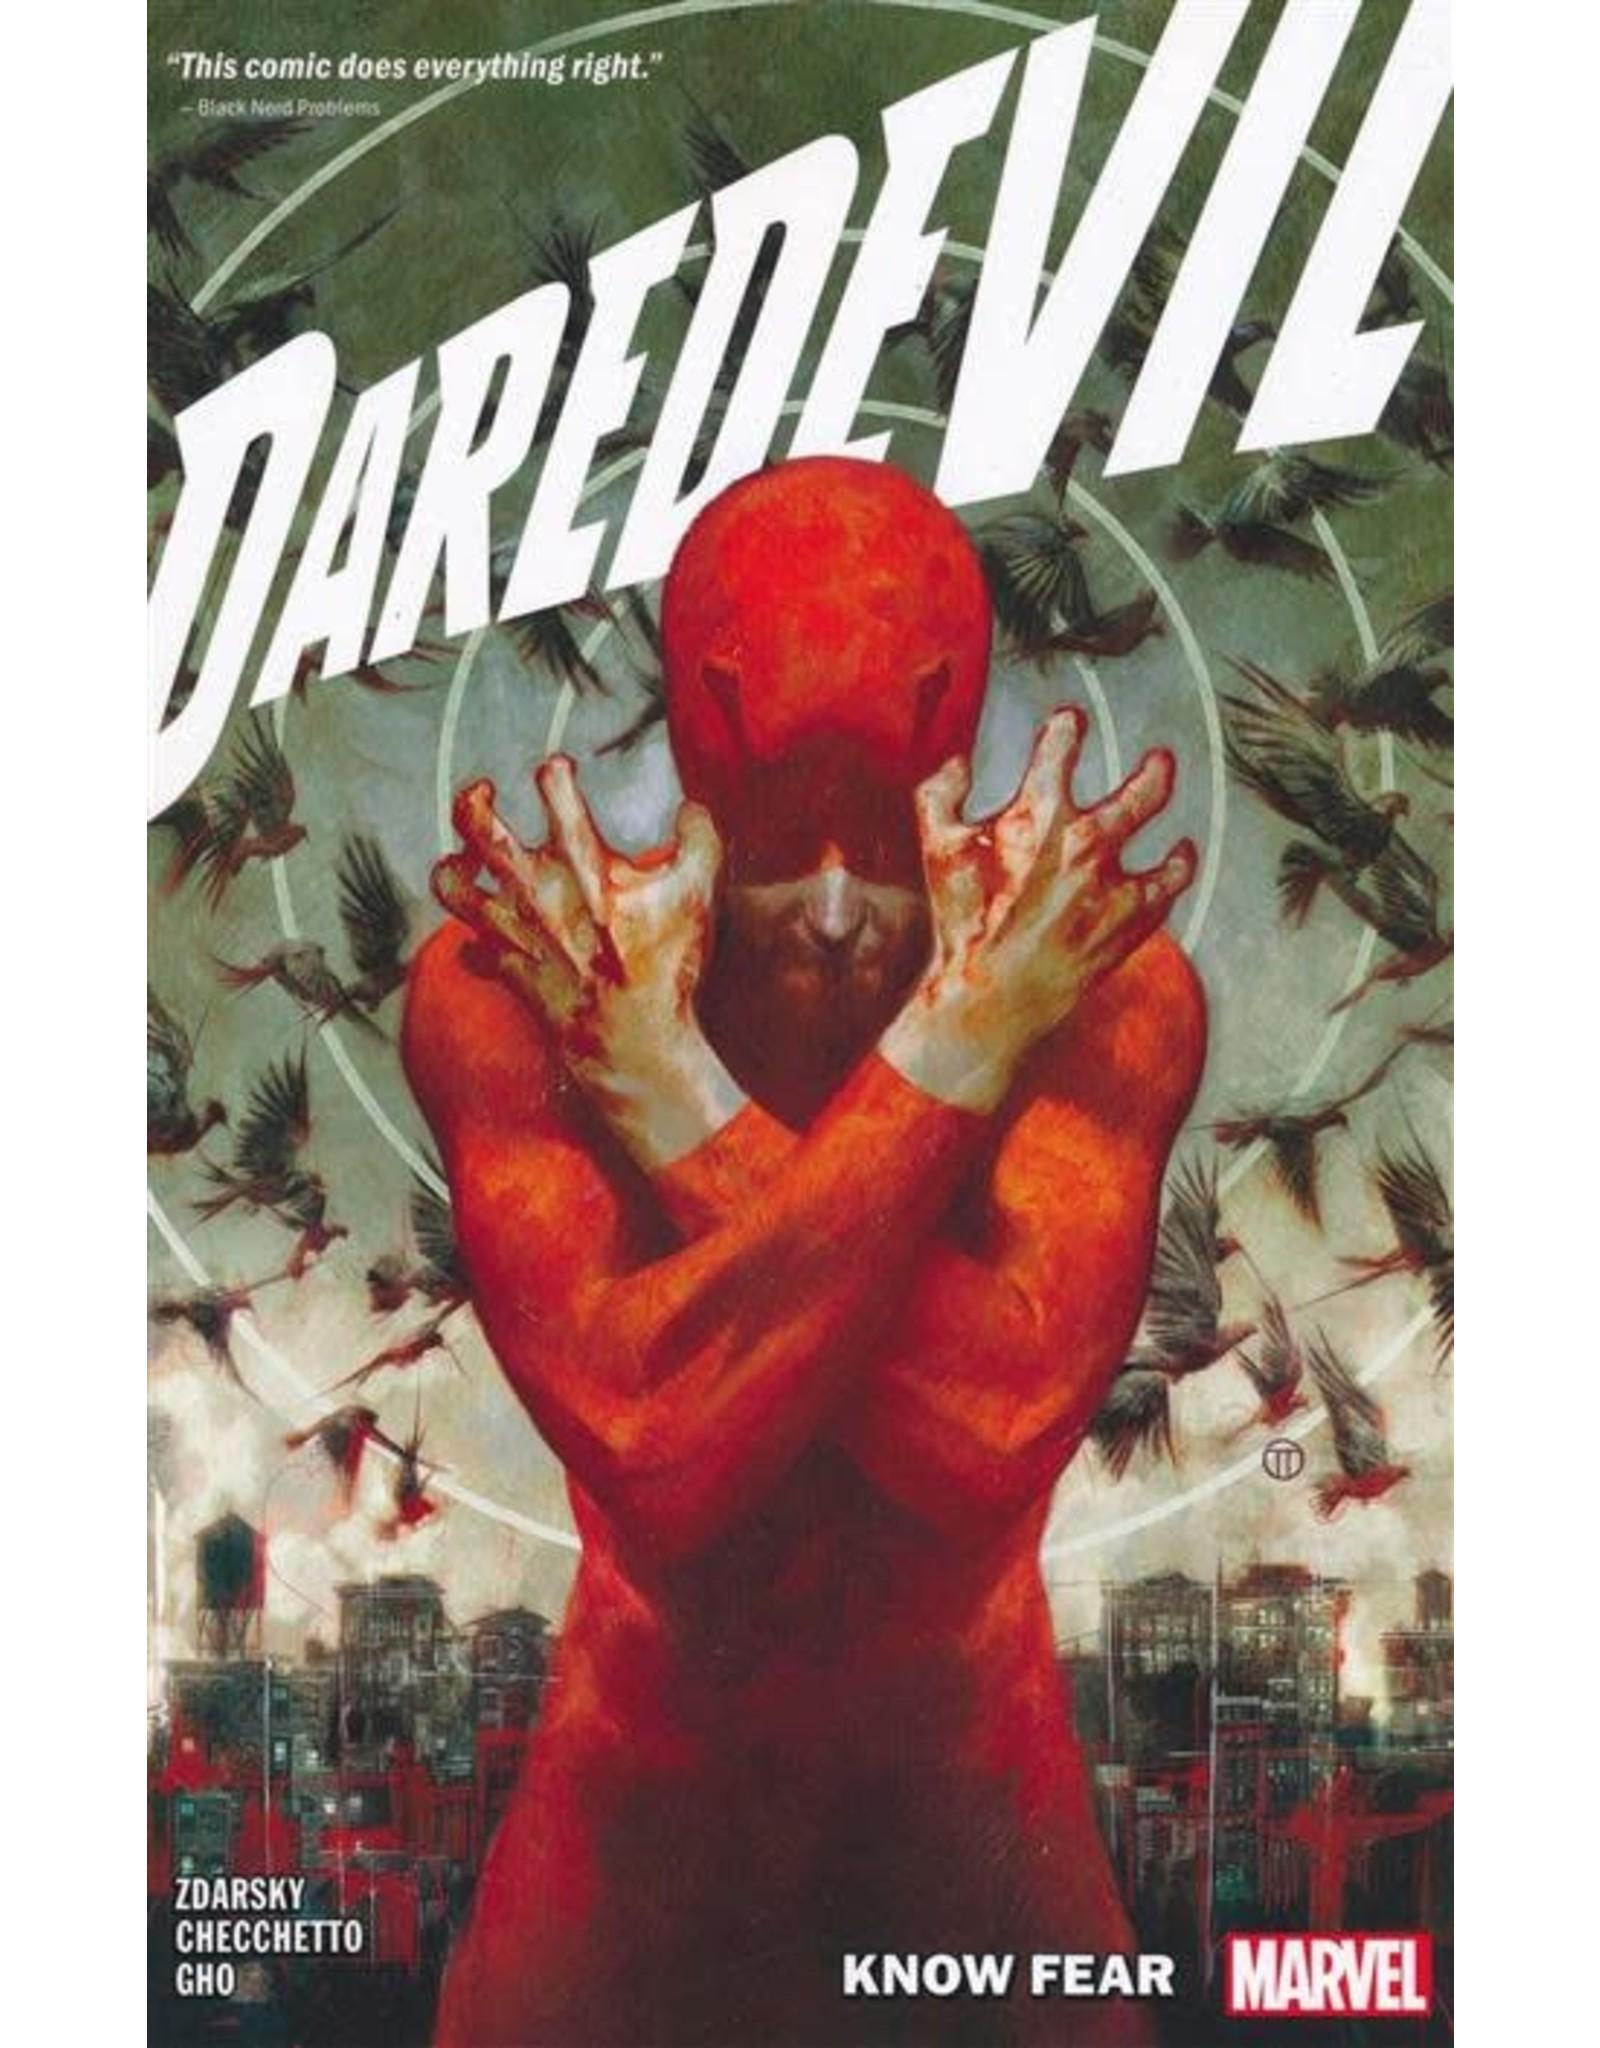 MARVEL COMICS DAREDEVIL BY CHIP ZDARSKY TP VOL 01 KNOW FEAR